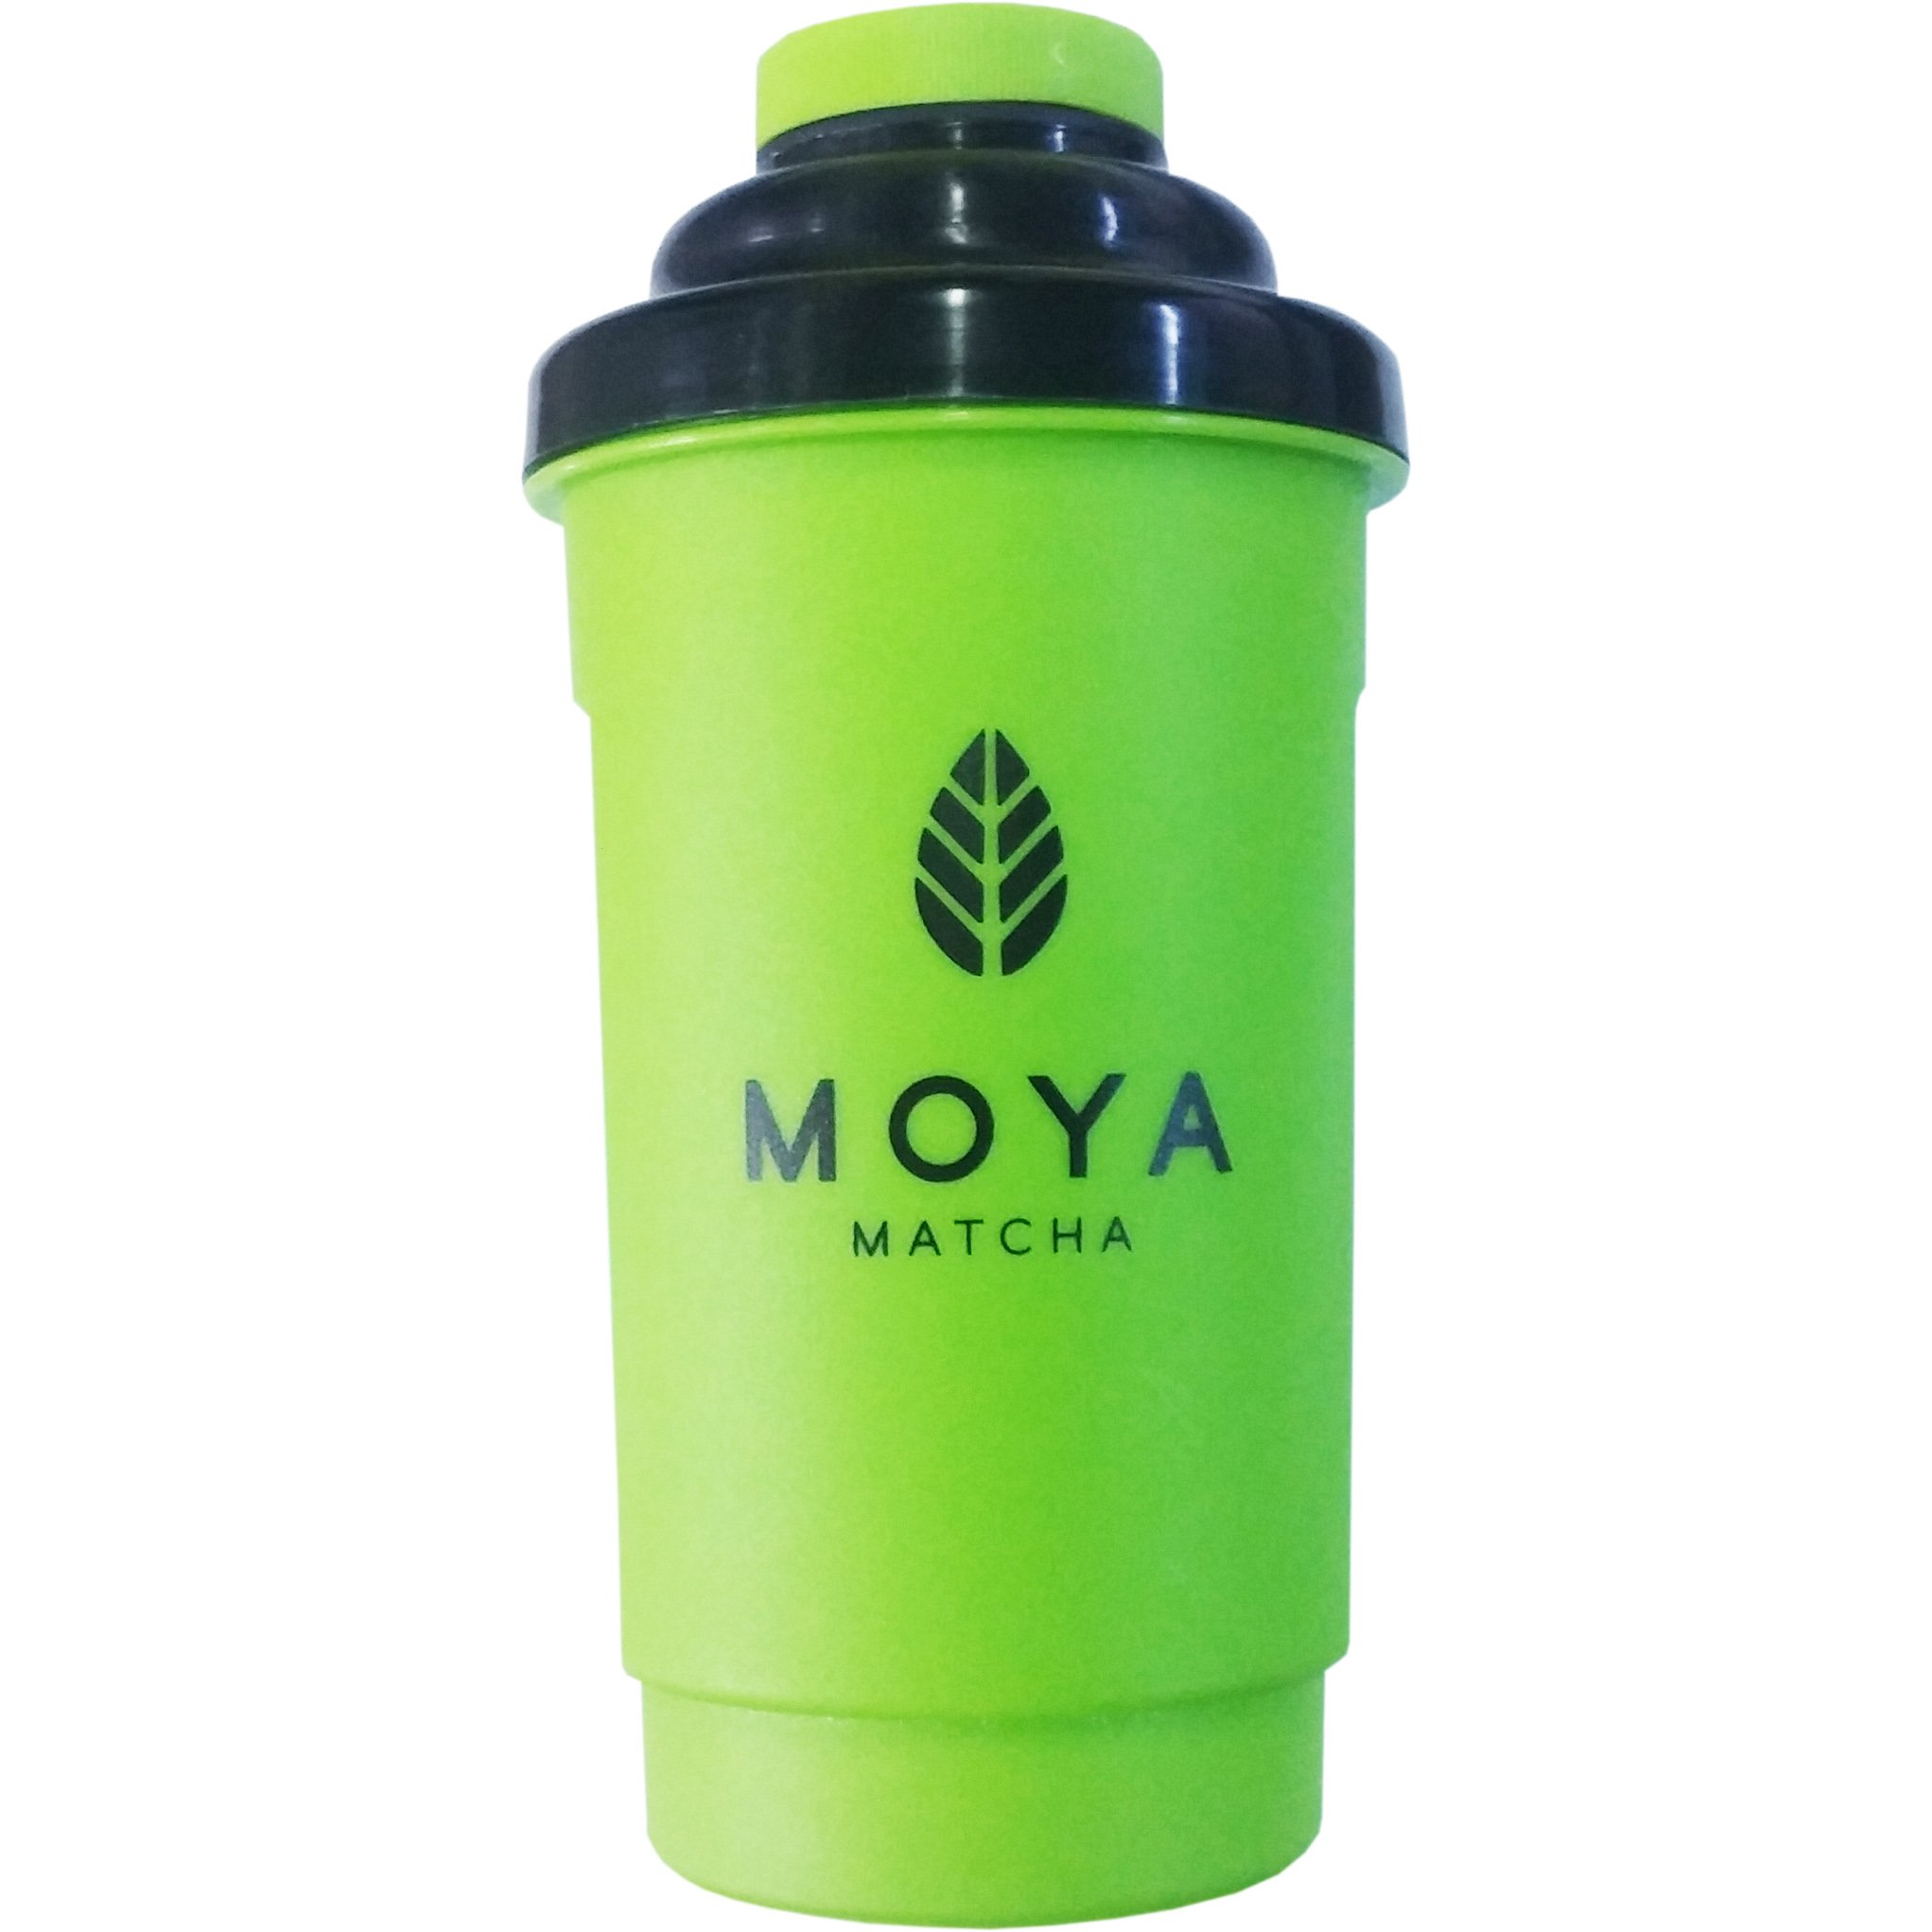 Vican Moya Matcha Shaker Πλαστικό Σέικερ για το Αγαπημένο σας Ρόφημα 1 Τεμάχιο βιταμίνες   αθλητές   πρωτείνες